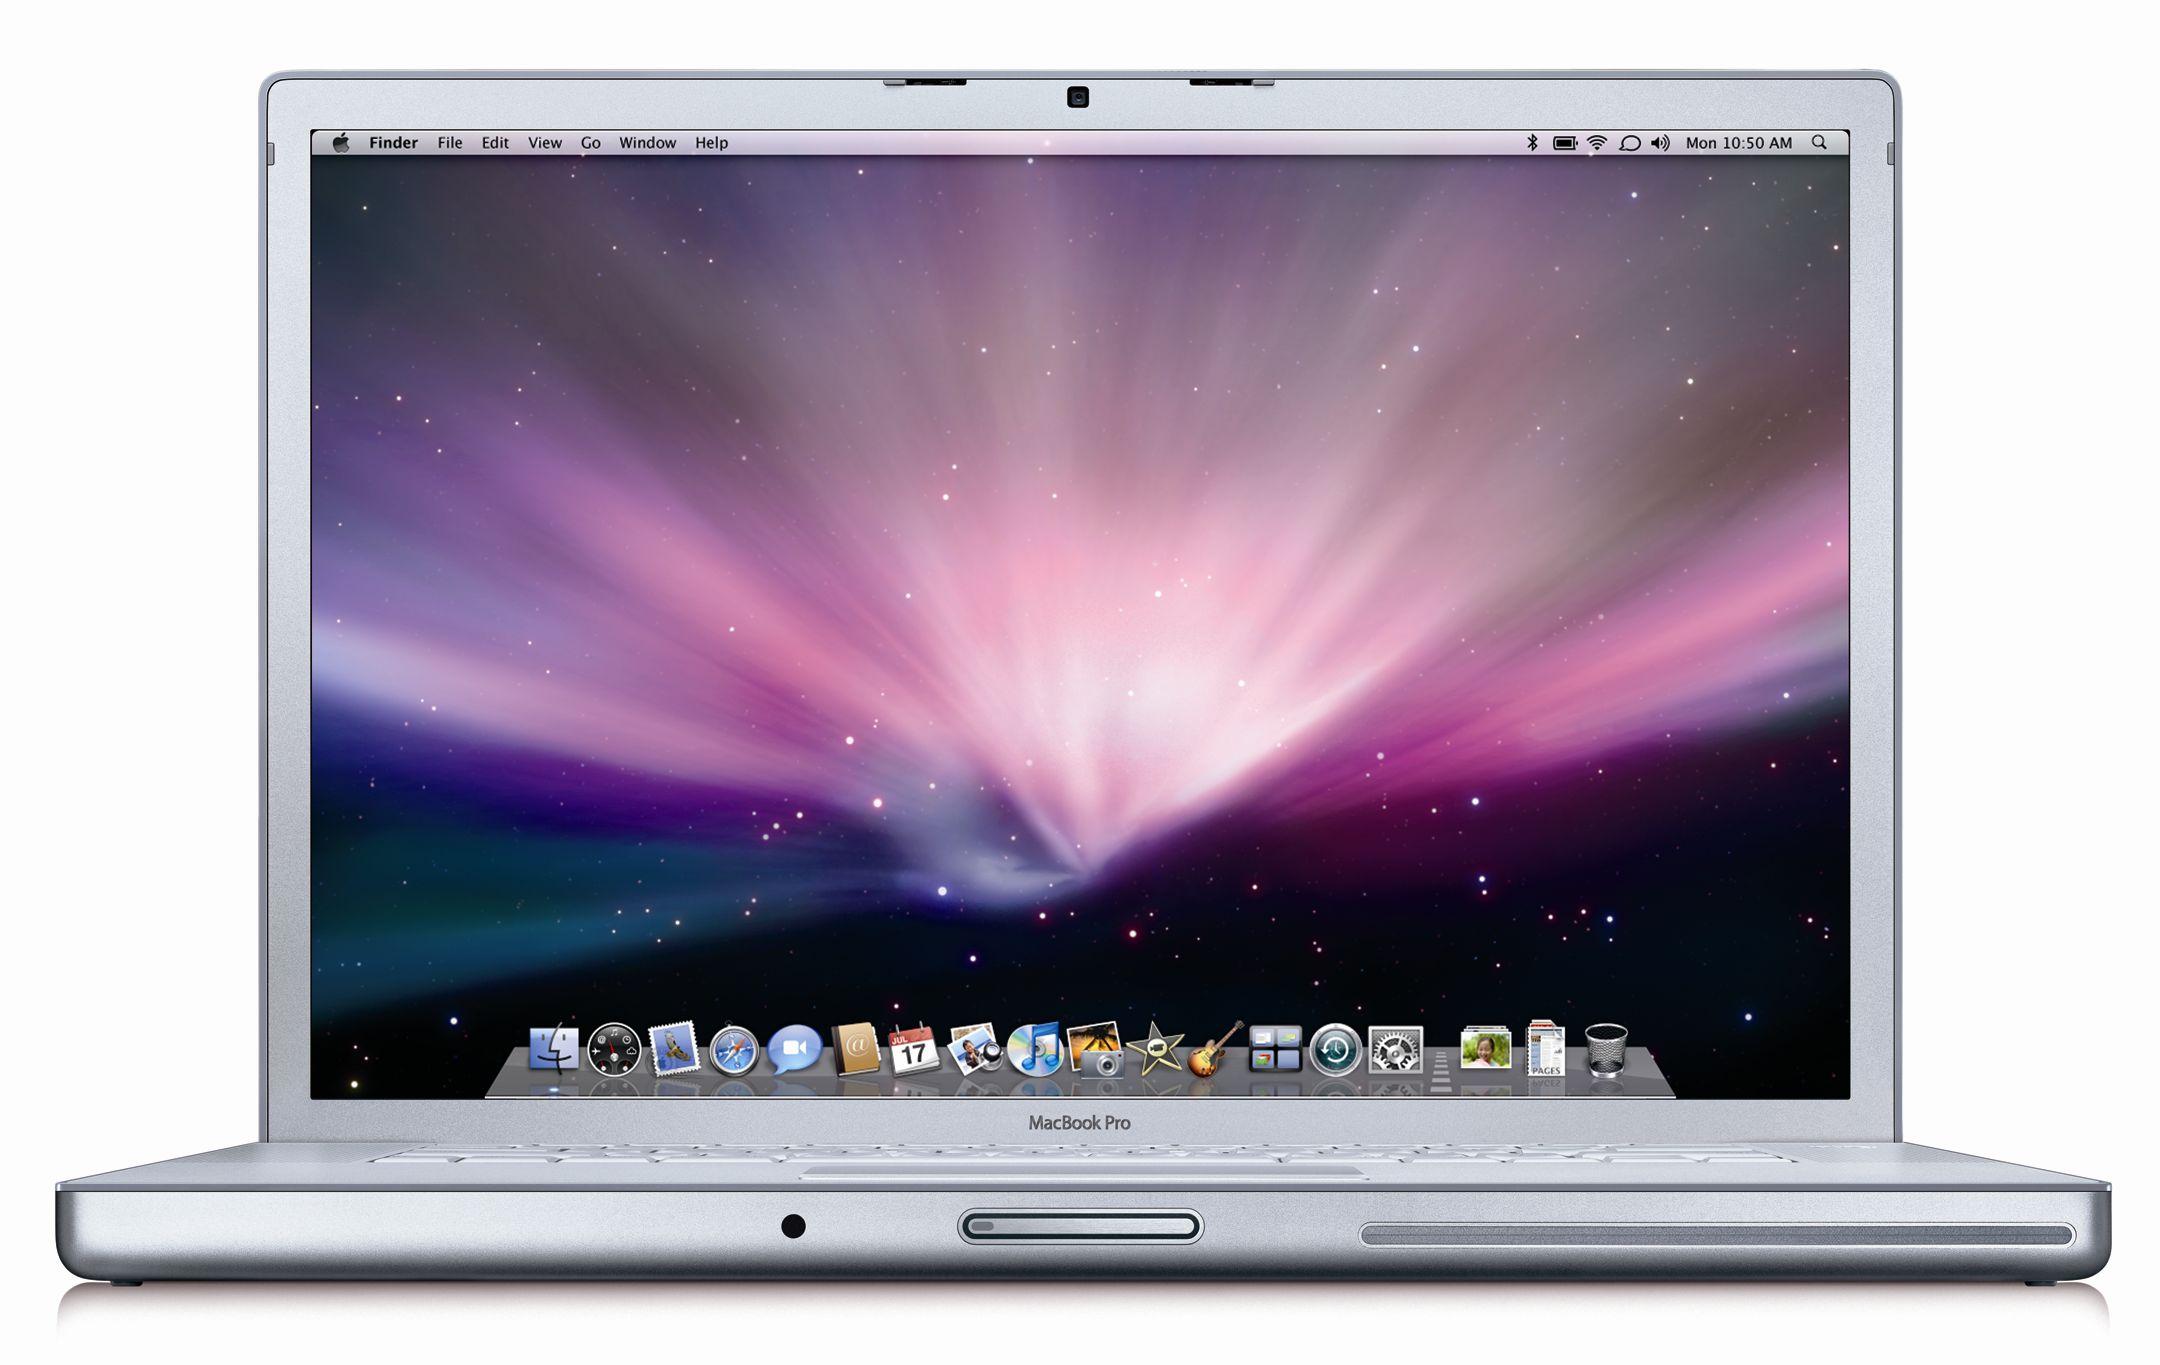 Refurbished Apple A Grade Macbook Pro 17-inch Laptop (Antiglare) 2 5GHZ  Core 2 Duo (Early 2008) MB166LL/A 320 GB HD 4 GB Memory 1680x1050 Display  Mac